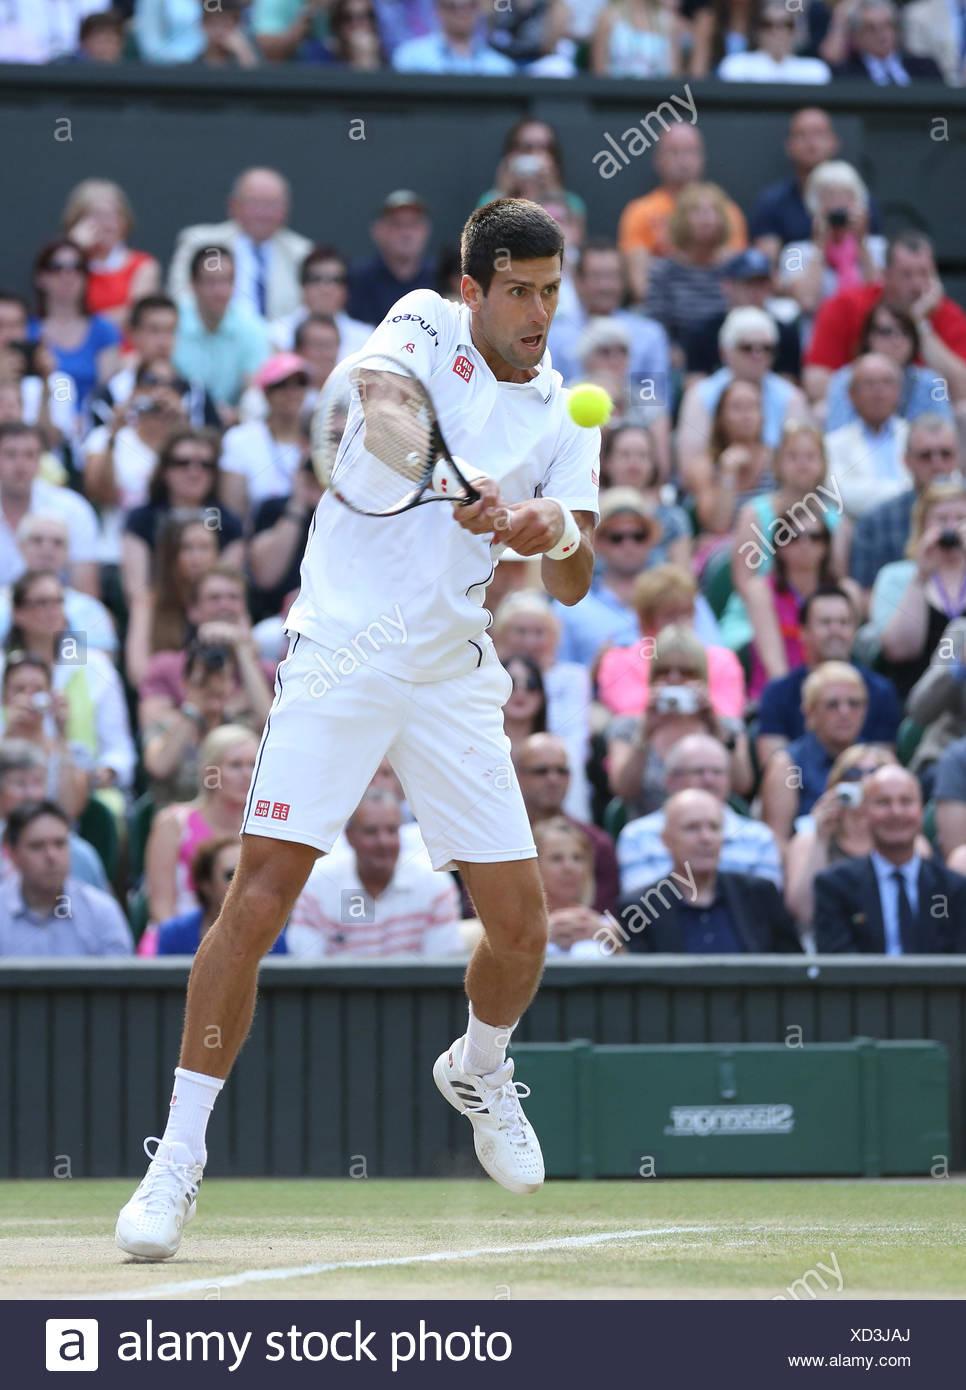 Novak Djokovic, SRB, Wimbledon Championships in 2014, ITF Grand Slam Tennis Tournament, AELTC, All England Lawn Tennis and - Stock Image